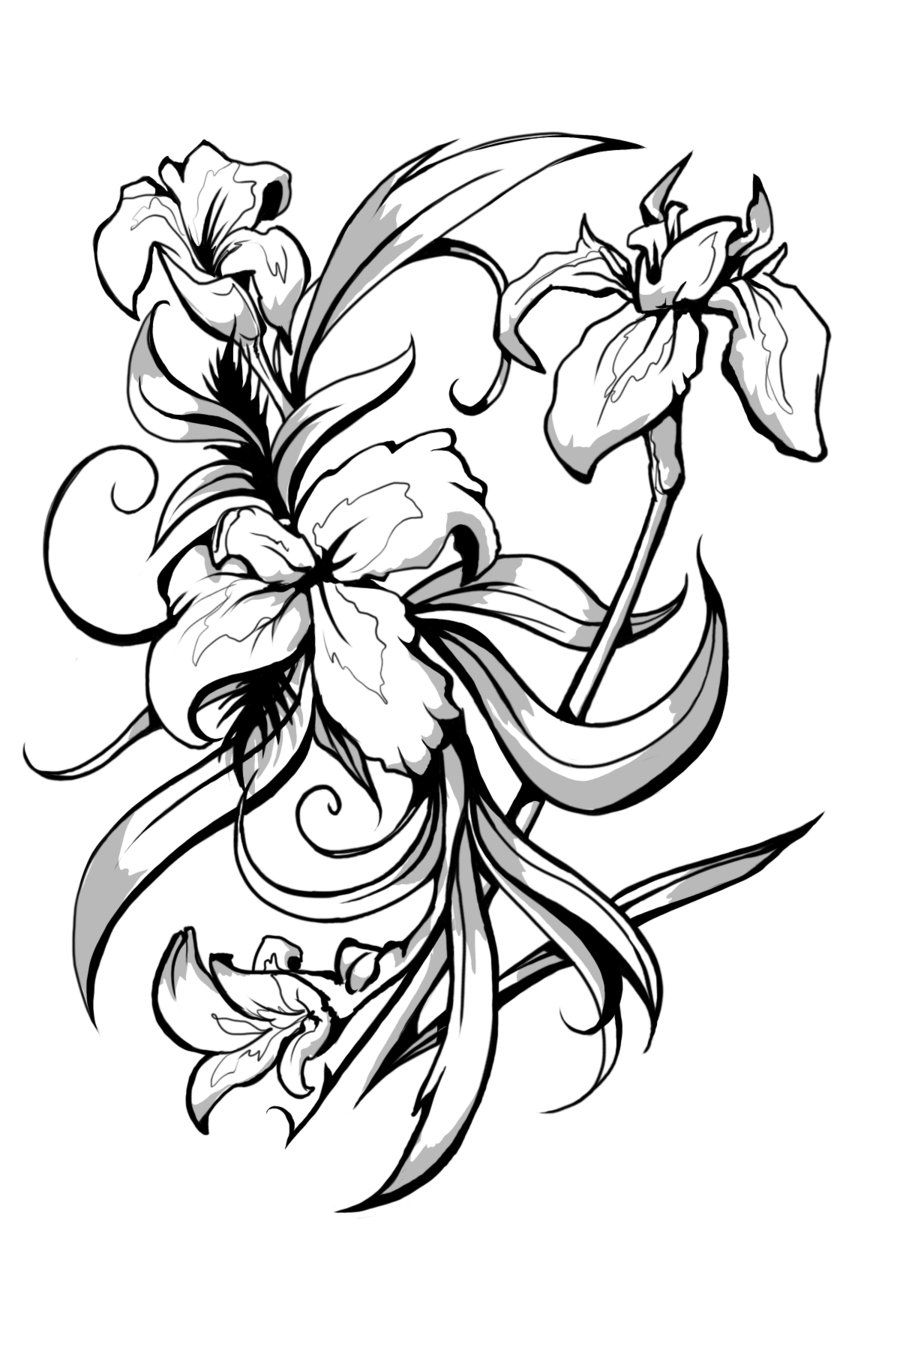 Iris clipart black and white jpg black and white library Iris symbol for Faith | Tats | Iris tattoo, Iris flowers, Flower ... jpg black and white library